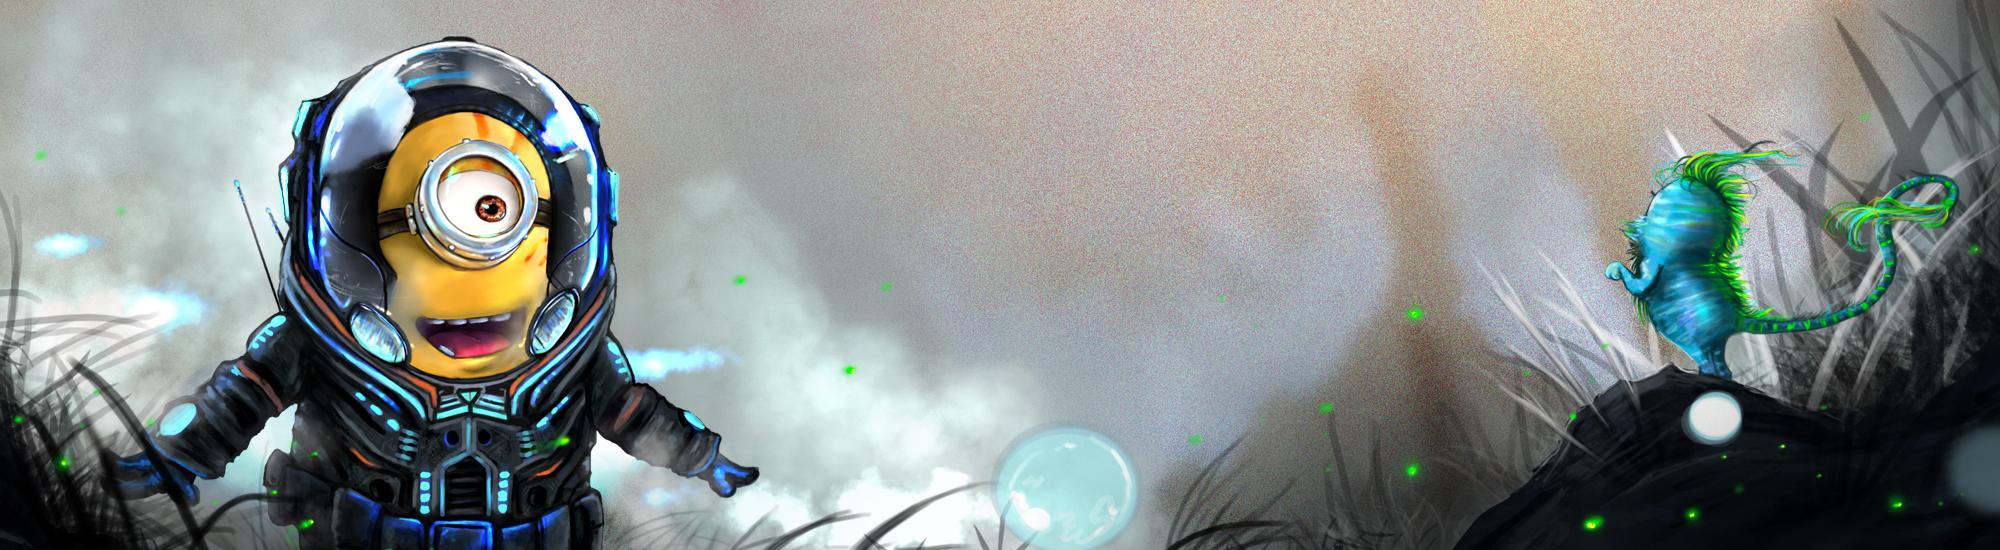 Intergalactic Explorer  Minion by AngelitaRamos